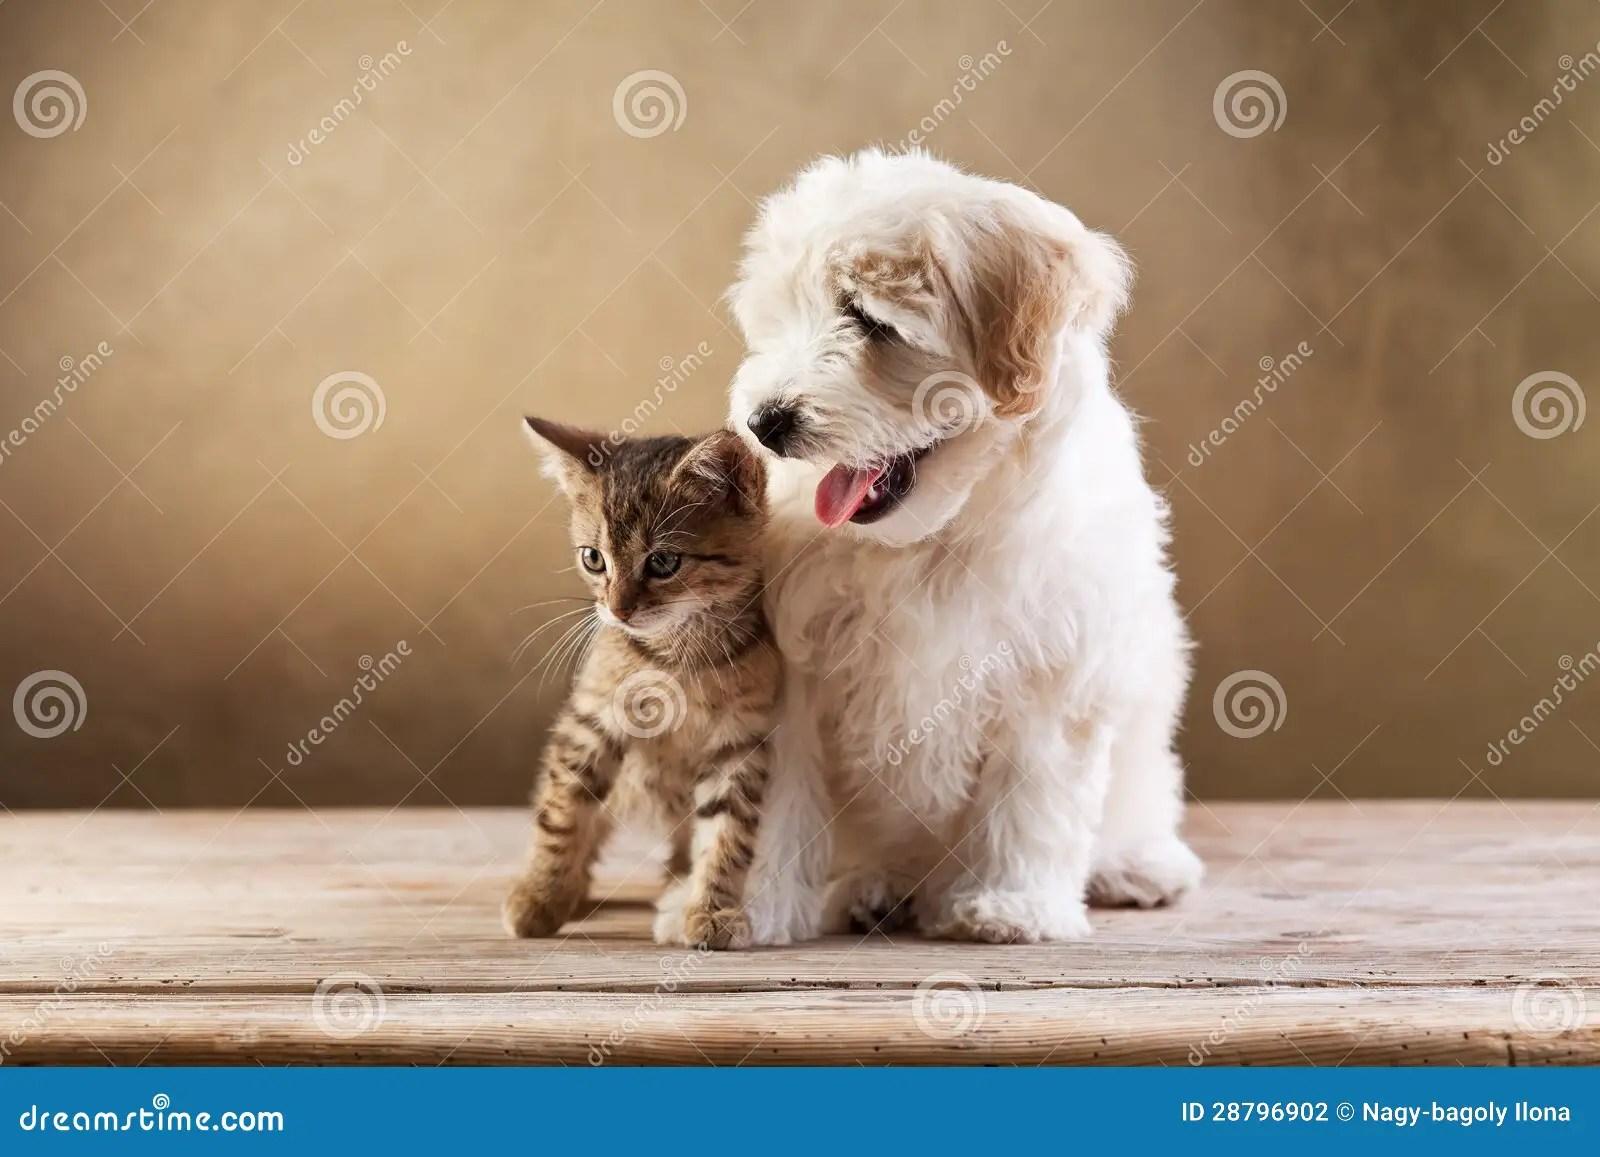 Free Cute Kitten Wallpapers Best Friends Kitten And Small Fluffy Dog Stock Photo